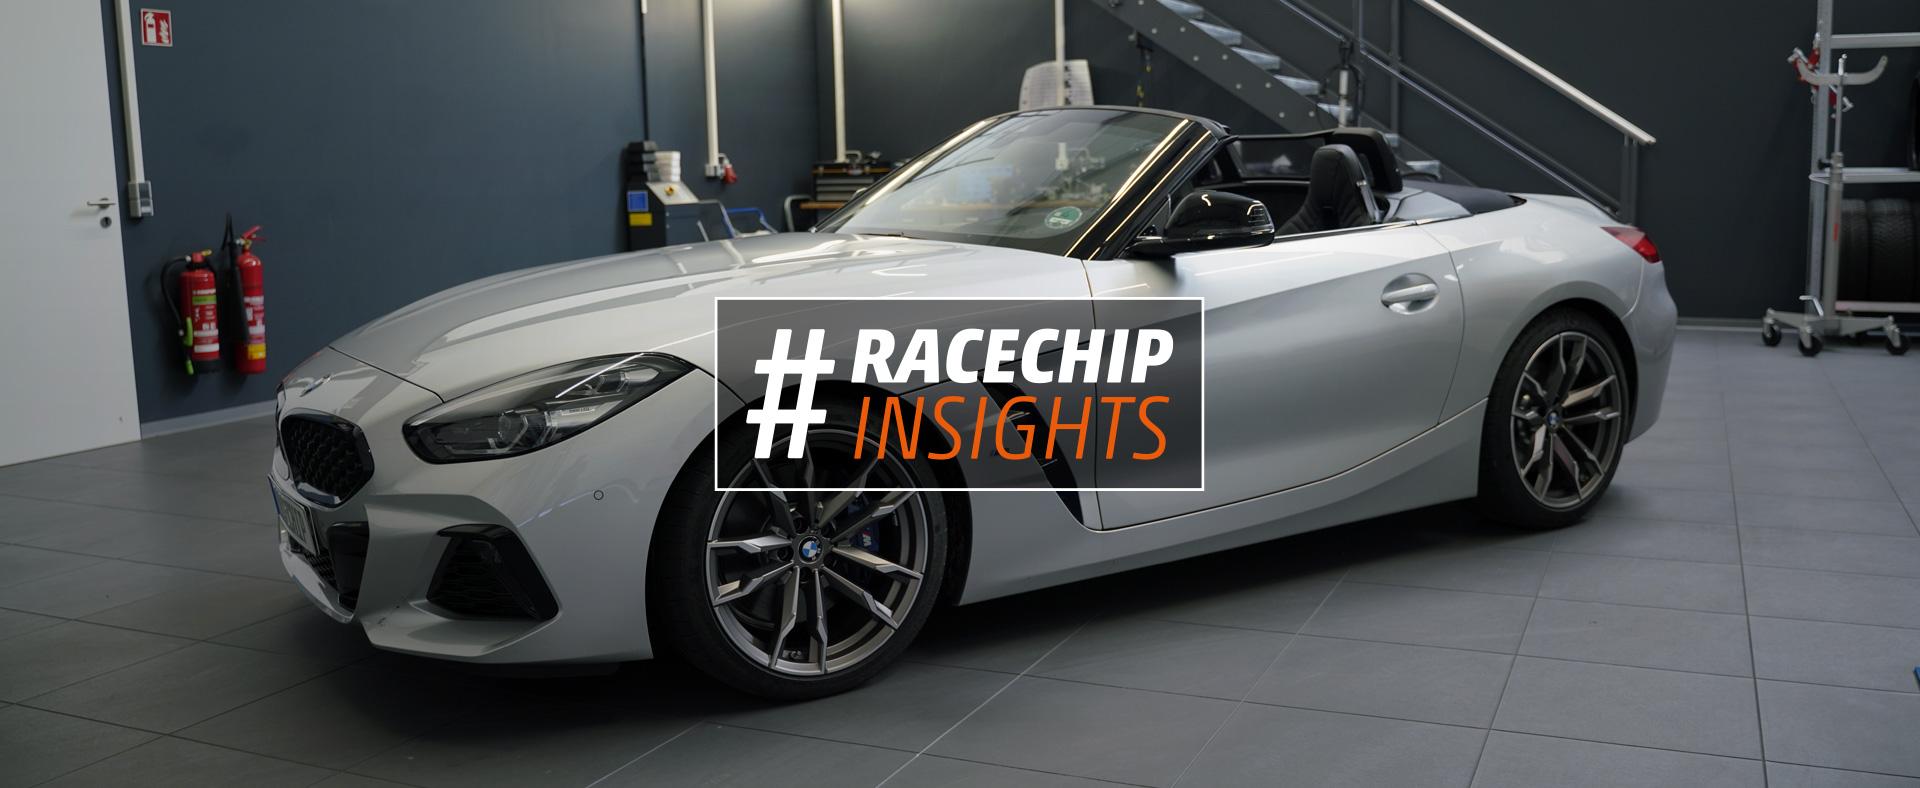 2019 Ford Focus ST 2.3L – RaceChip Performance Test